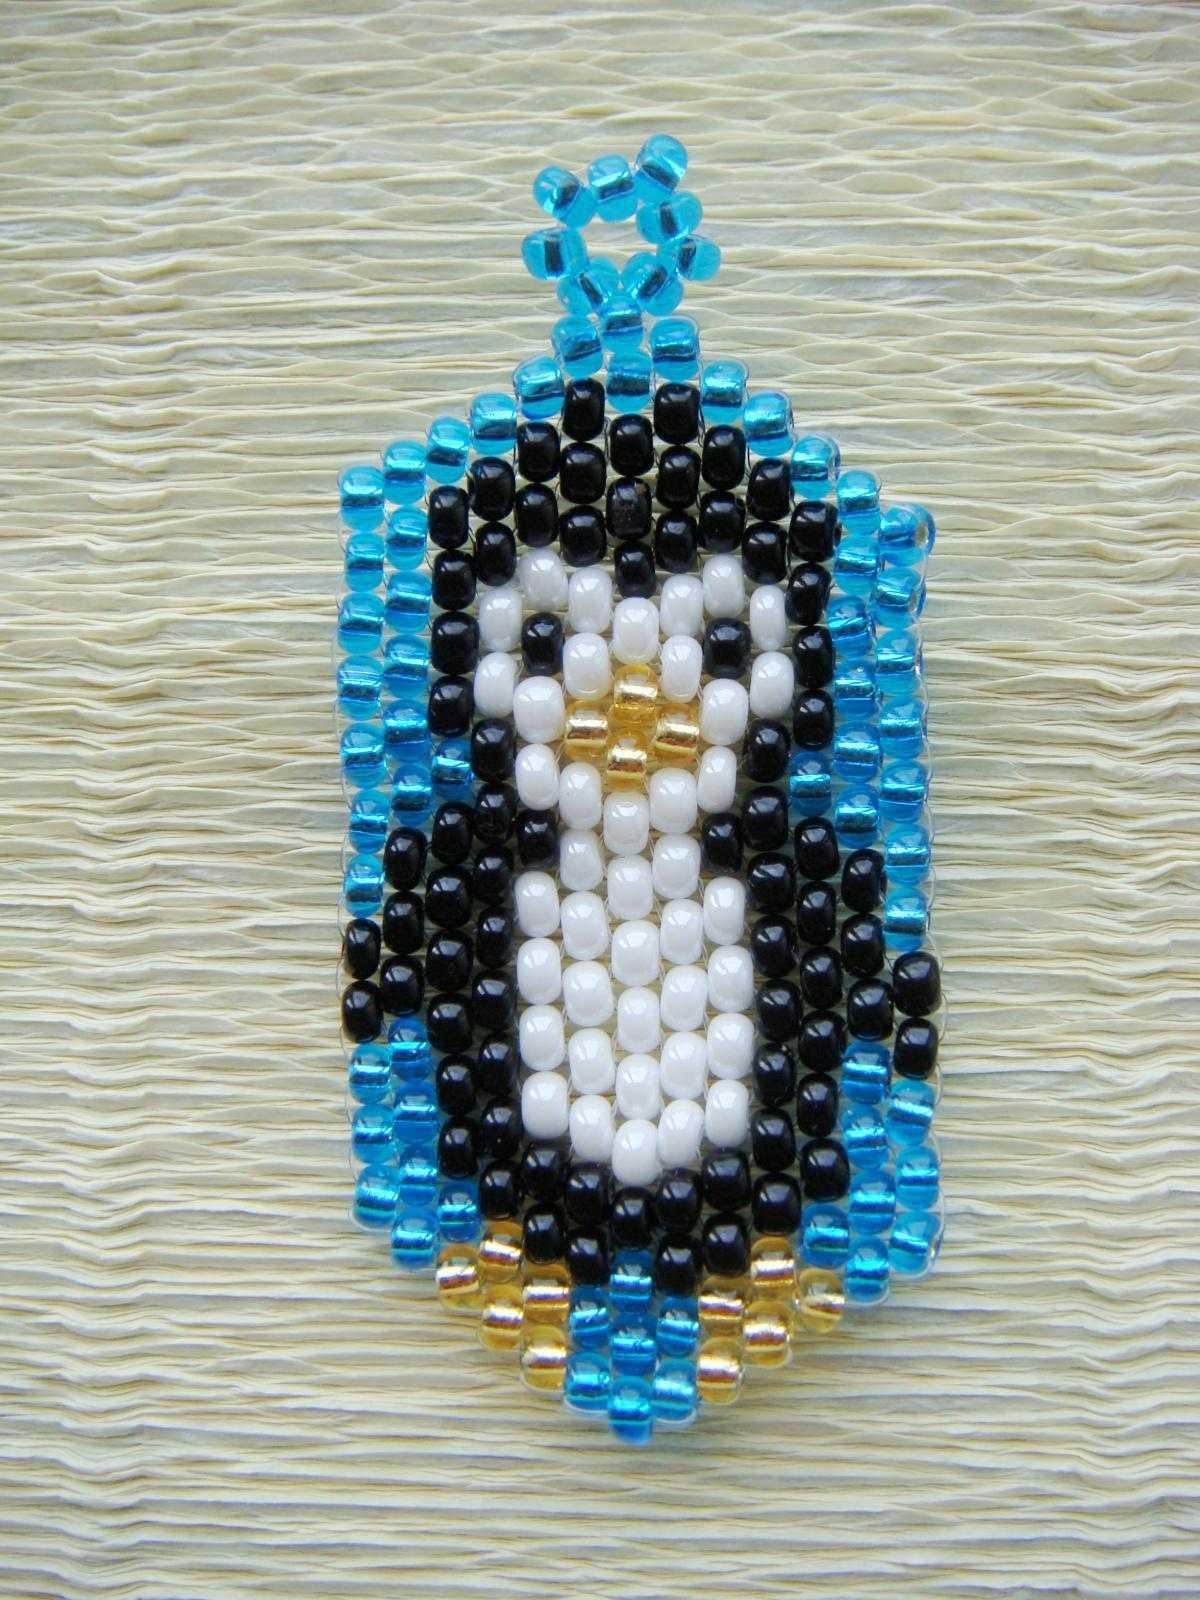 Пингвин из бисера: МК и схема плетения: http://handmadefrom.ru/biser/pingvin_bisera.php